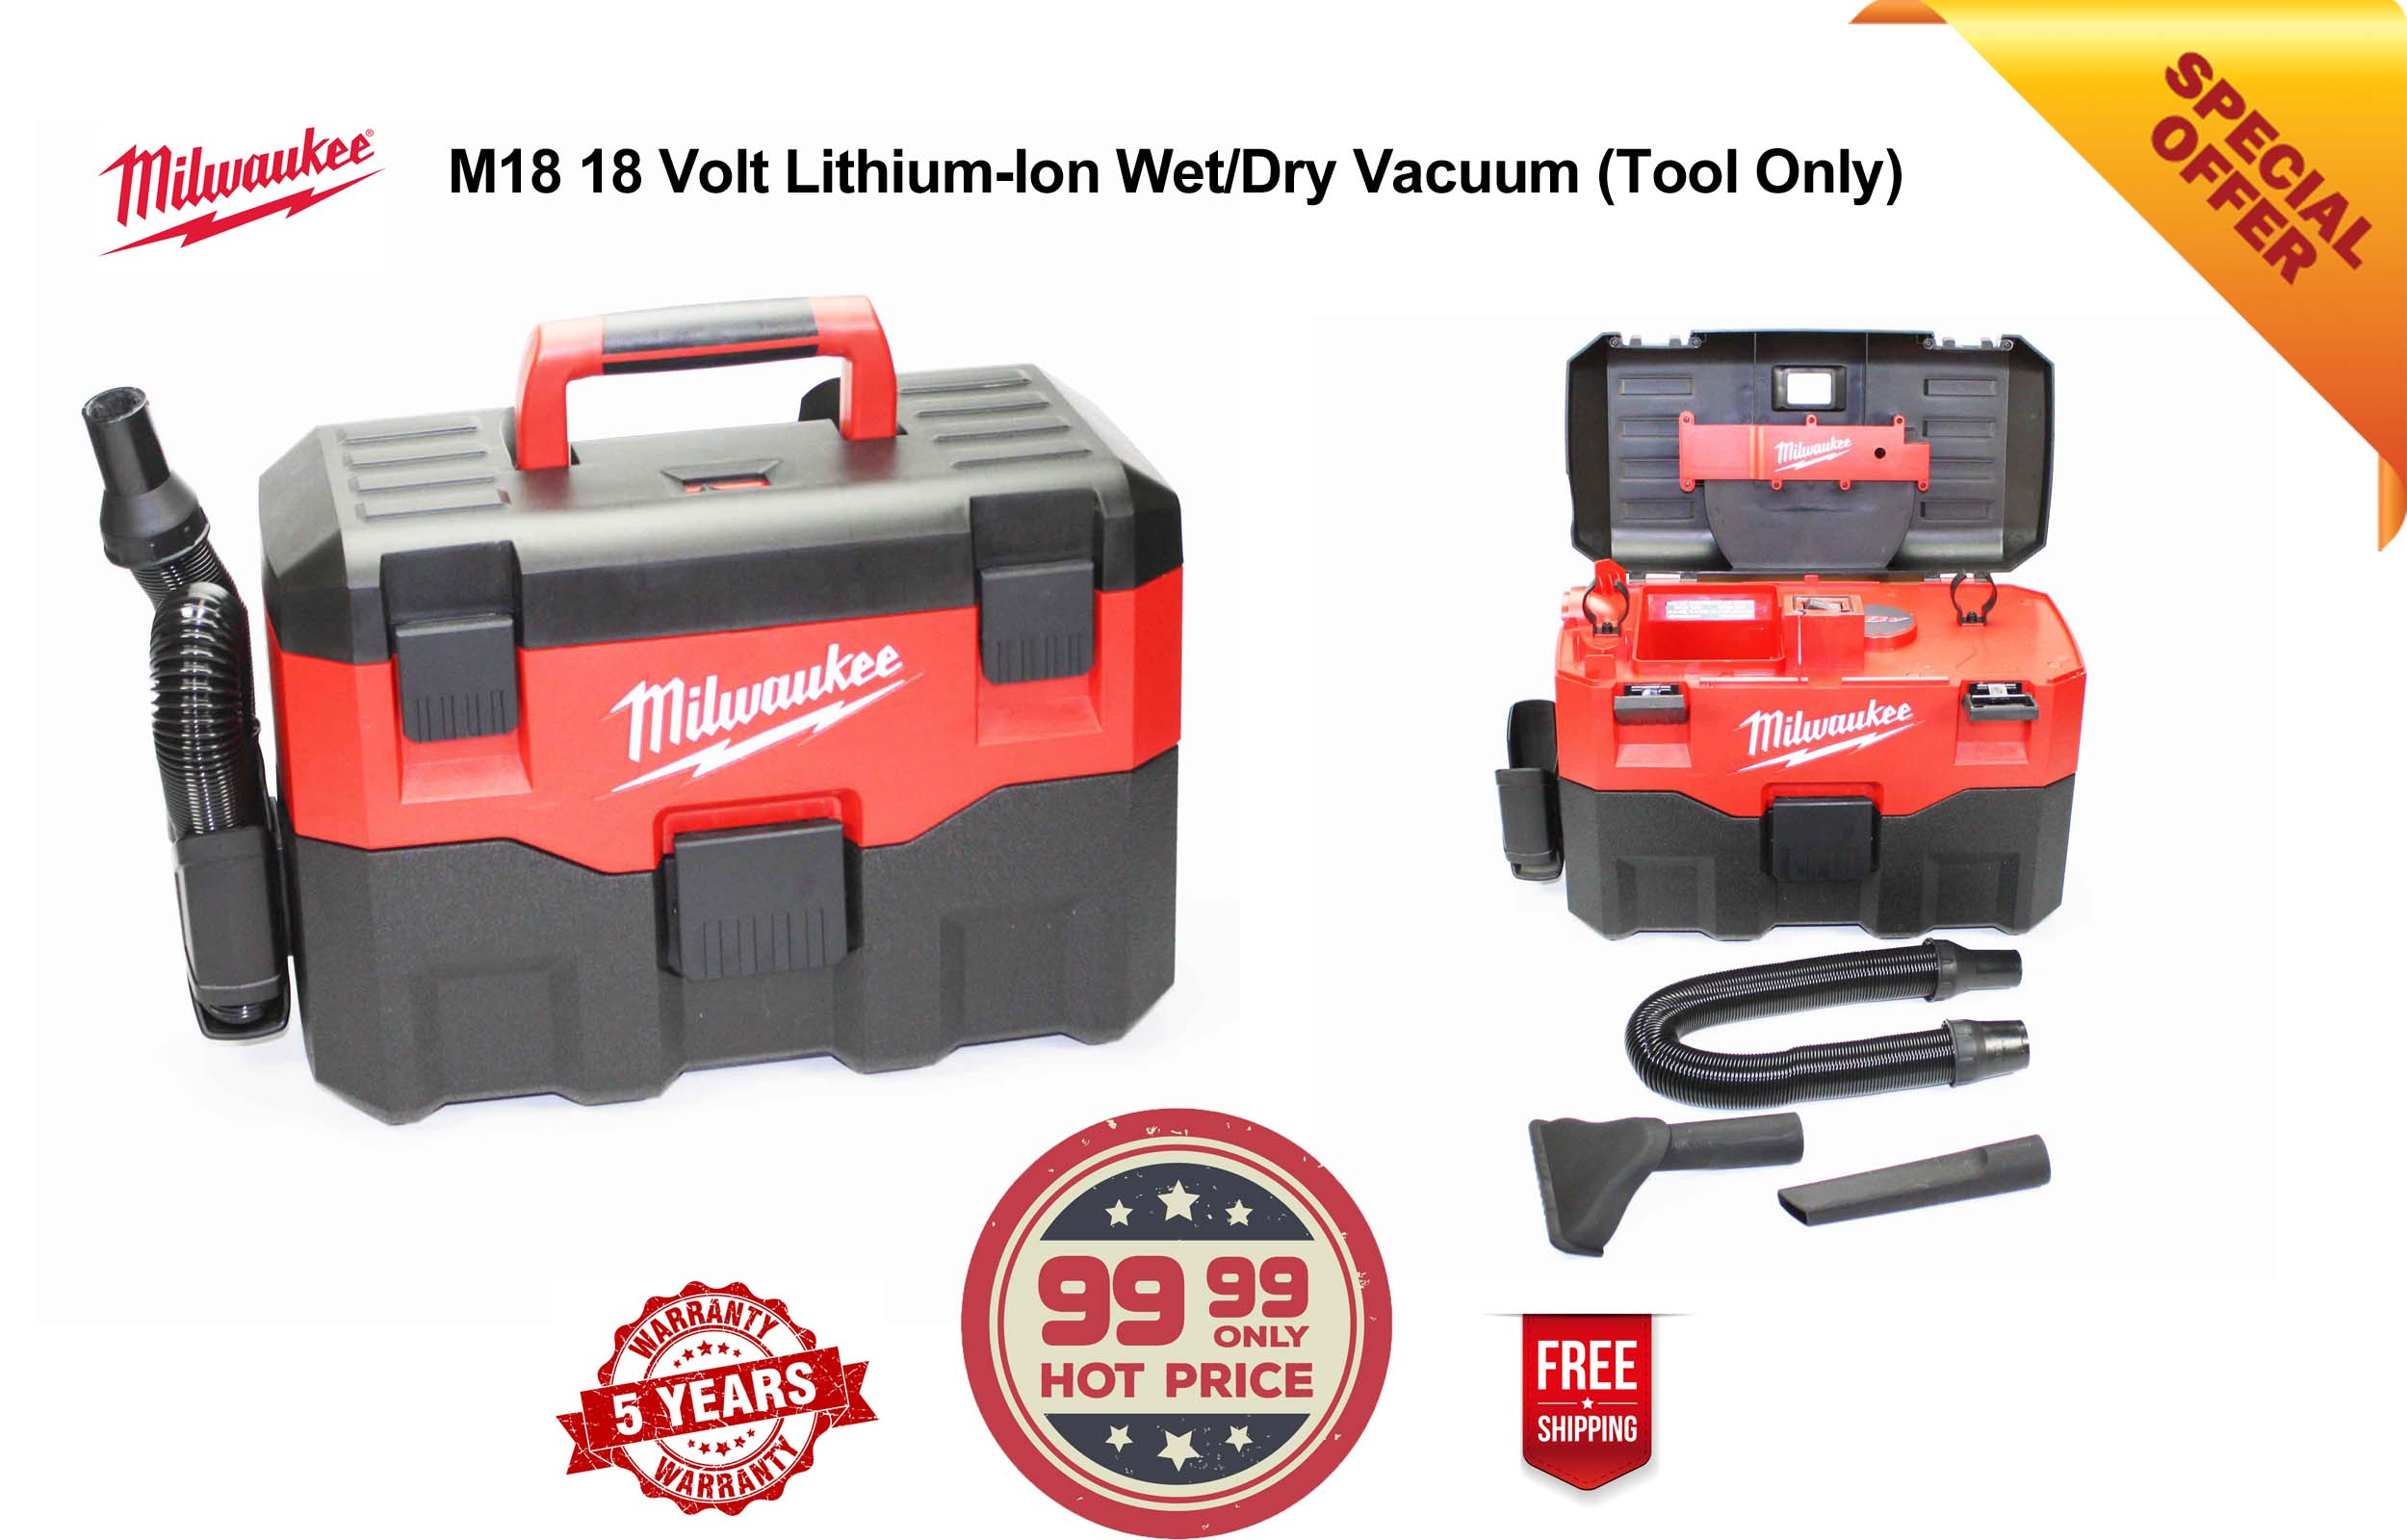 0880-20 Milwaukee M18 Wet Dryer Vacuum Cleaner